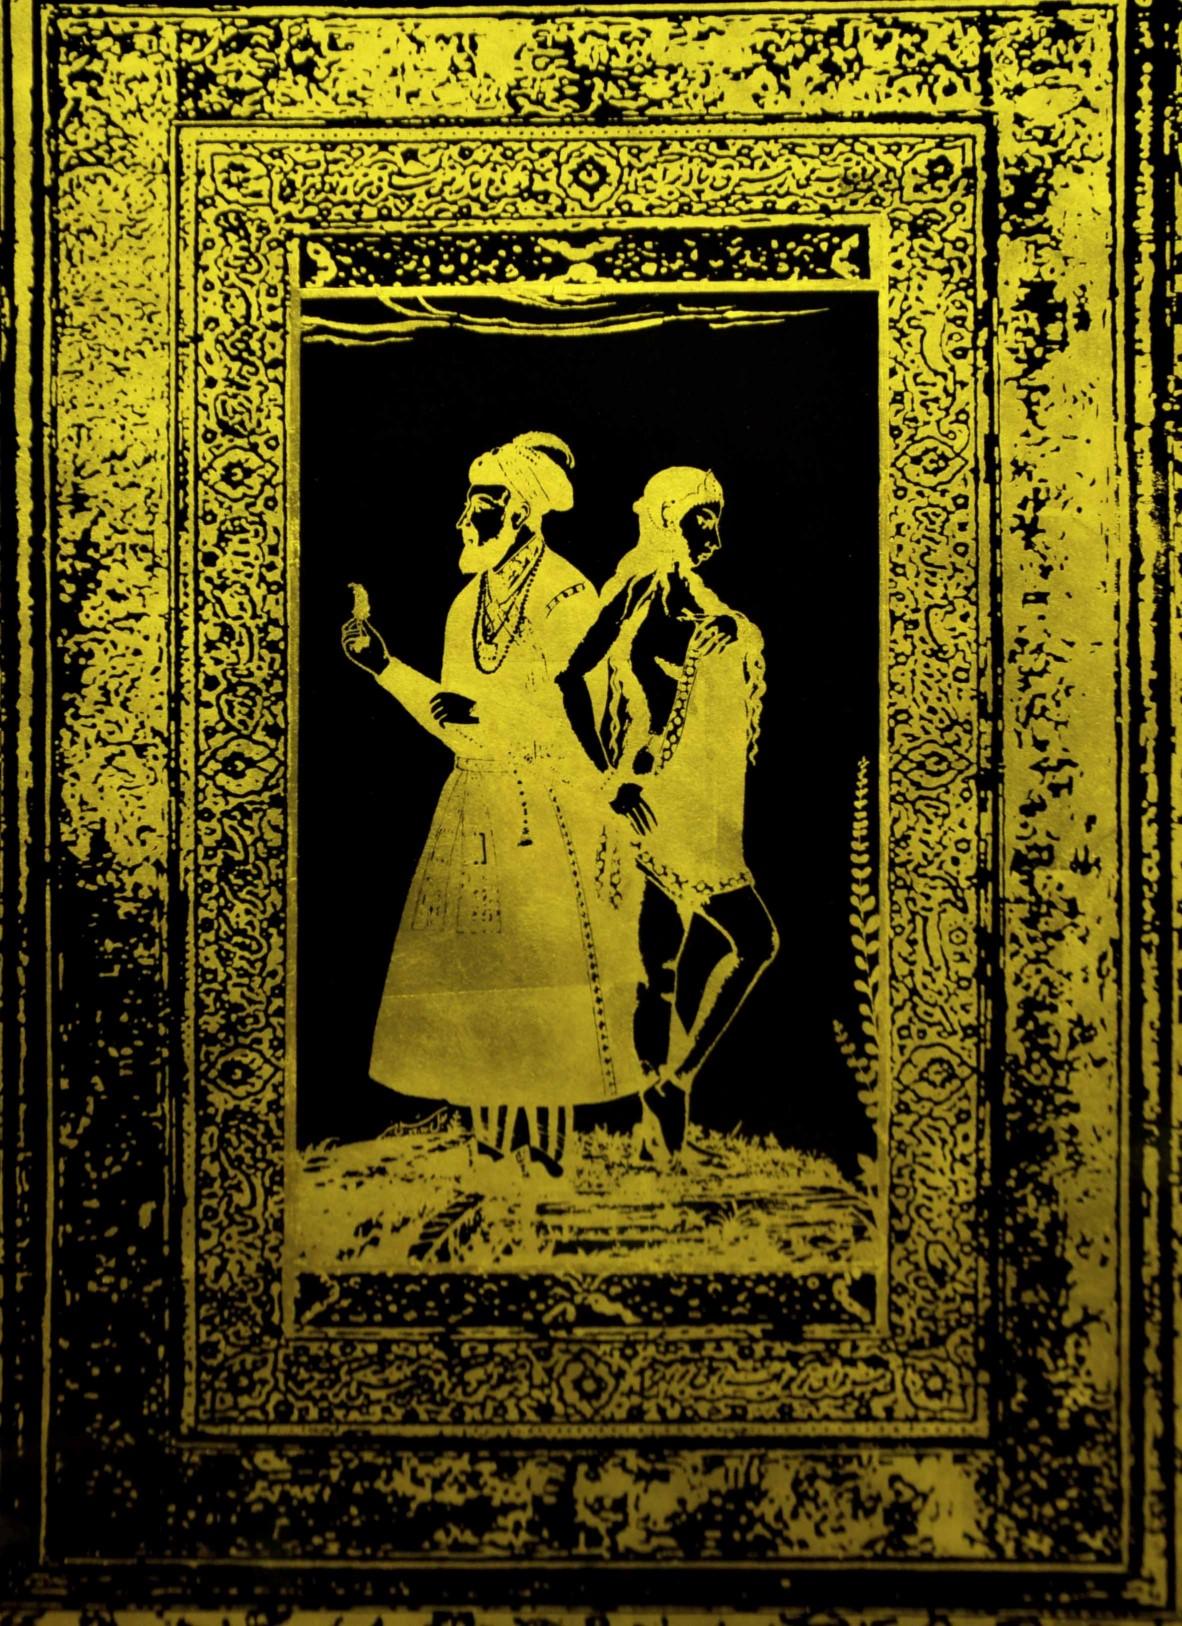 Title: The golden history of falsehood1.<br></br>Medium gold leaf on black coated paper<br></br>Size 40x55 inches